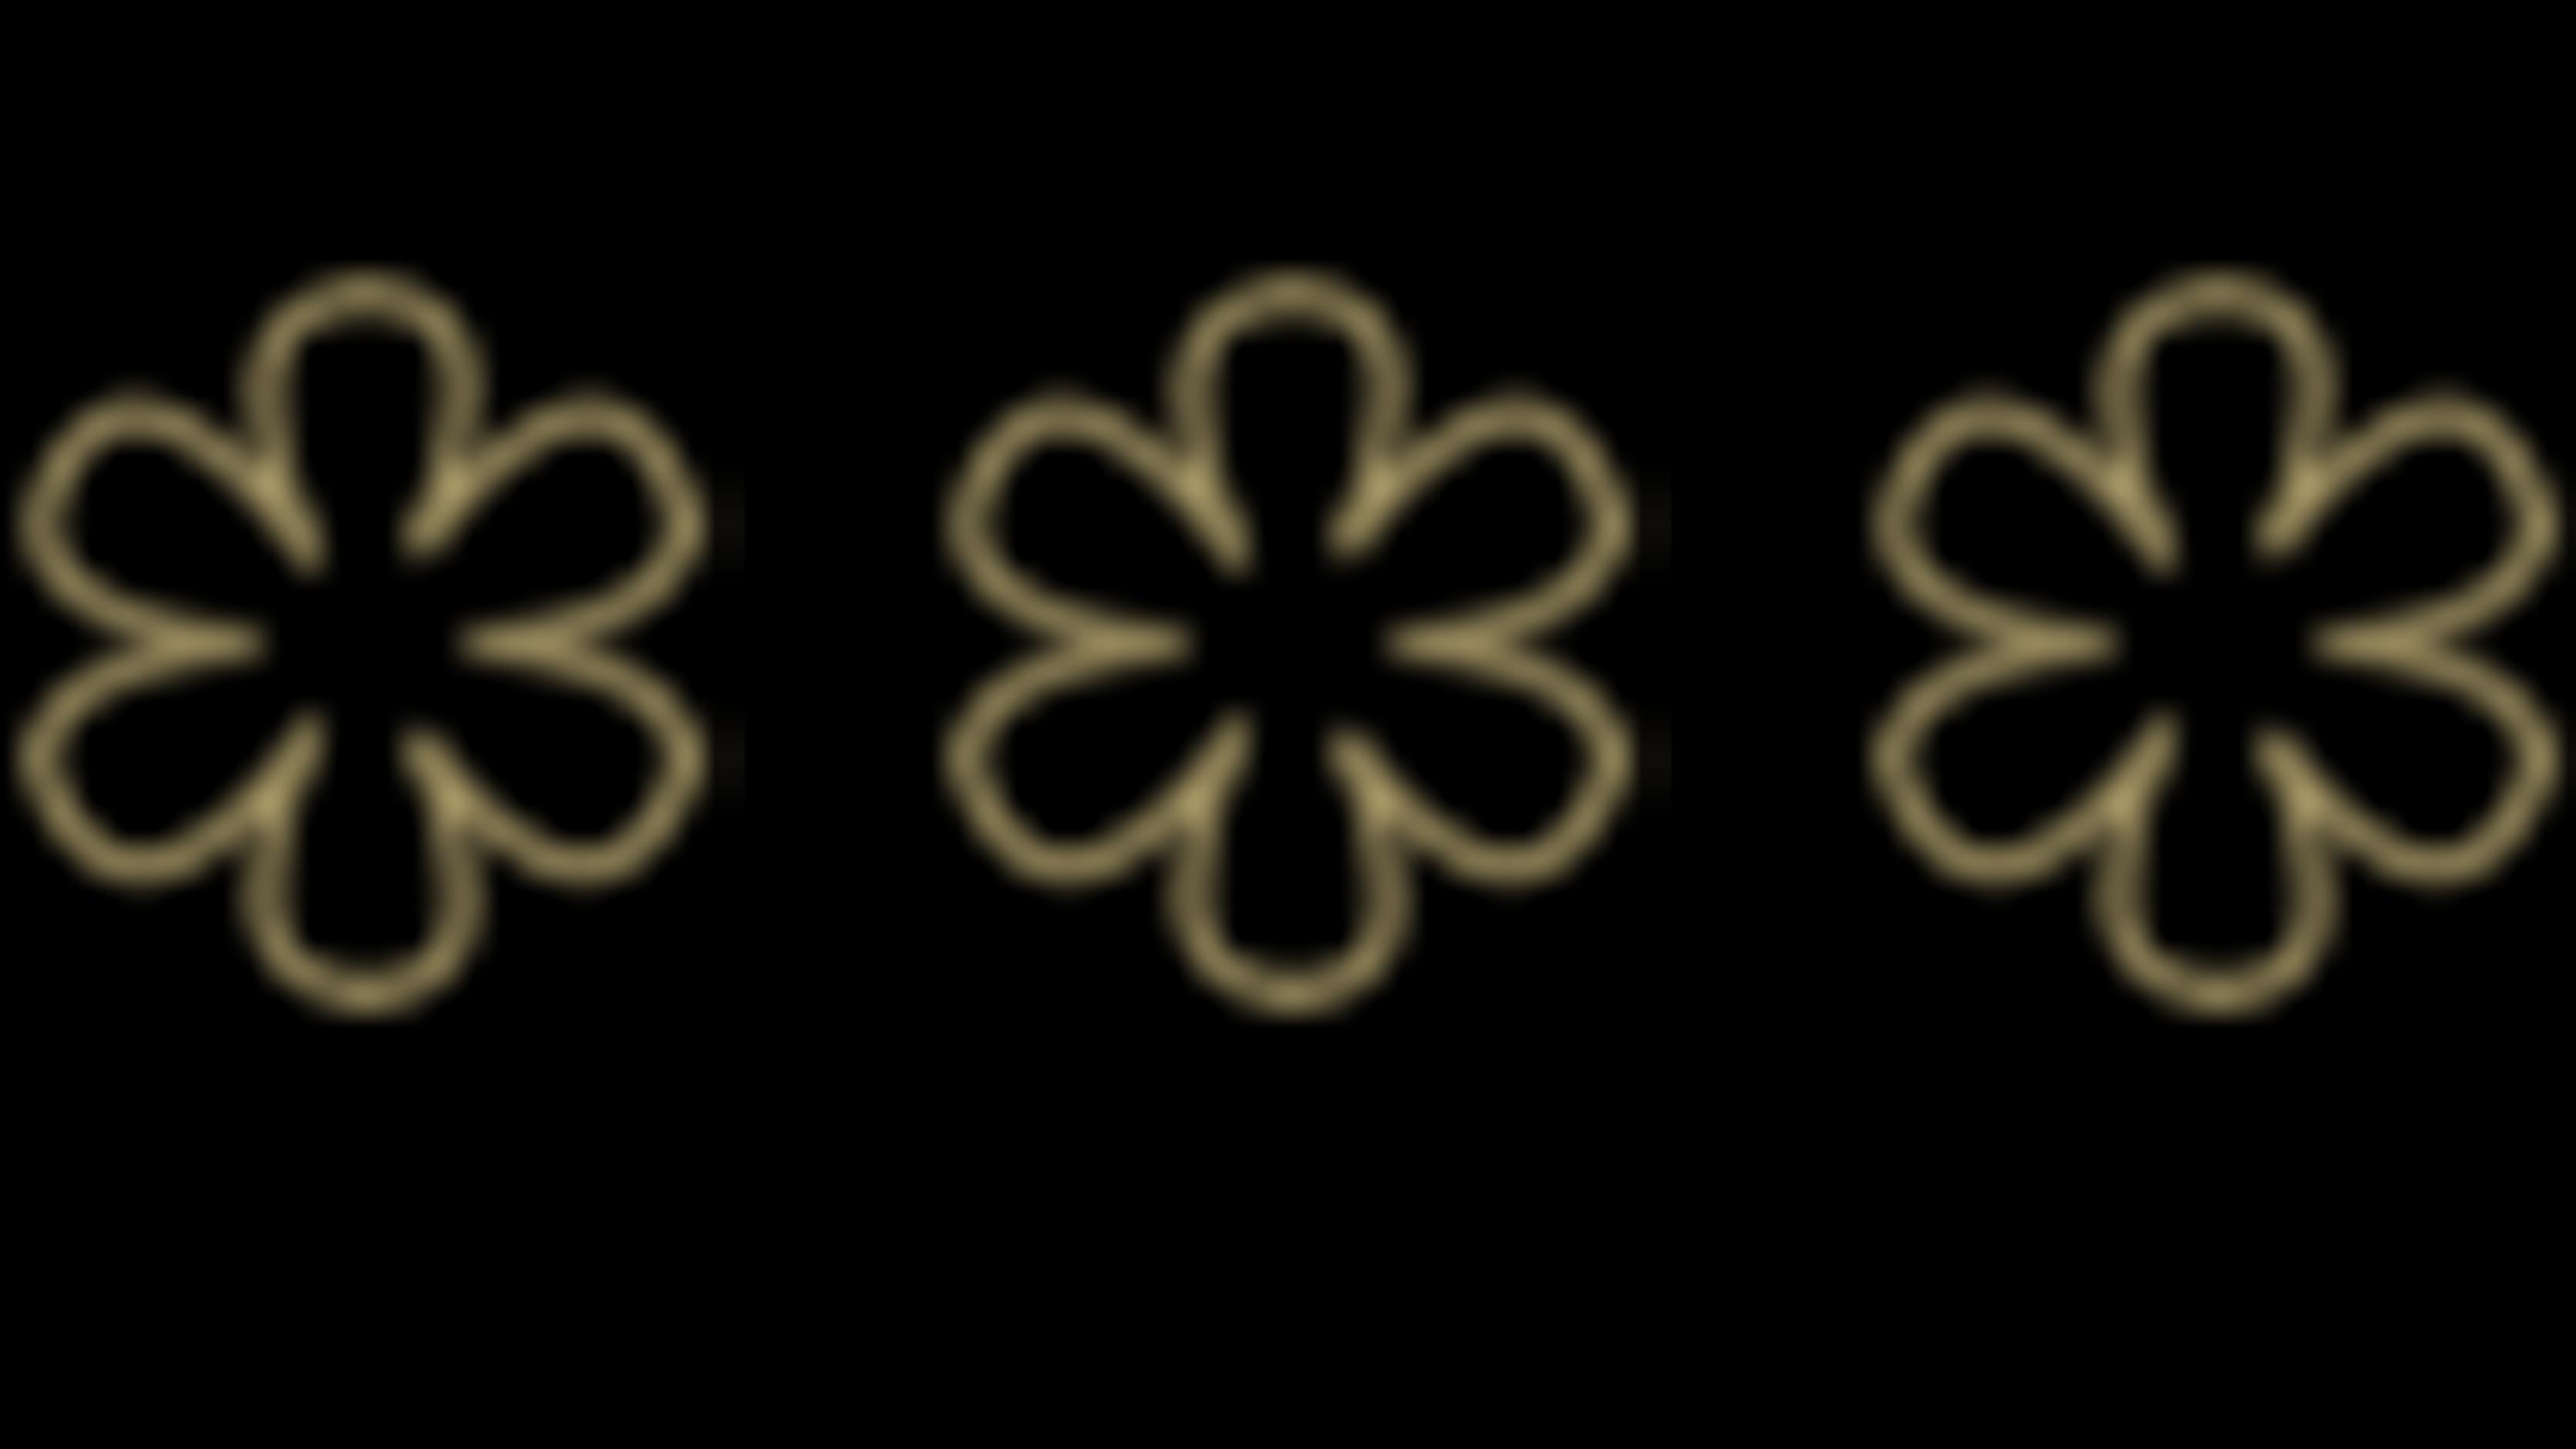 Jumeirah icons 2 stars